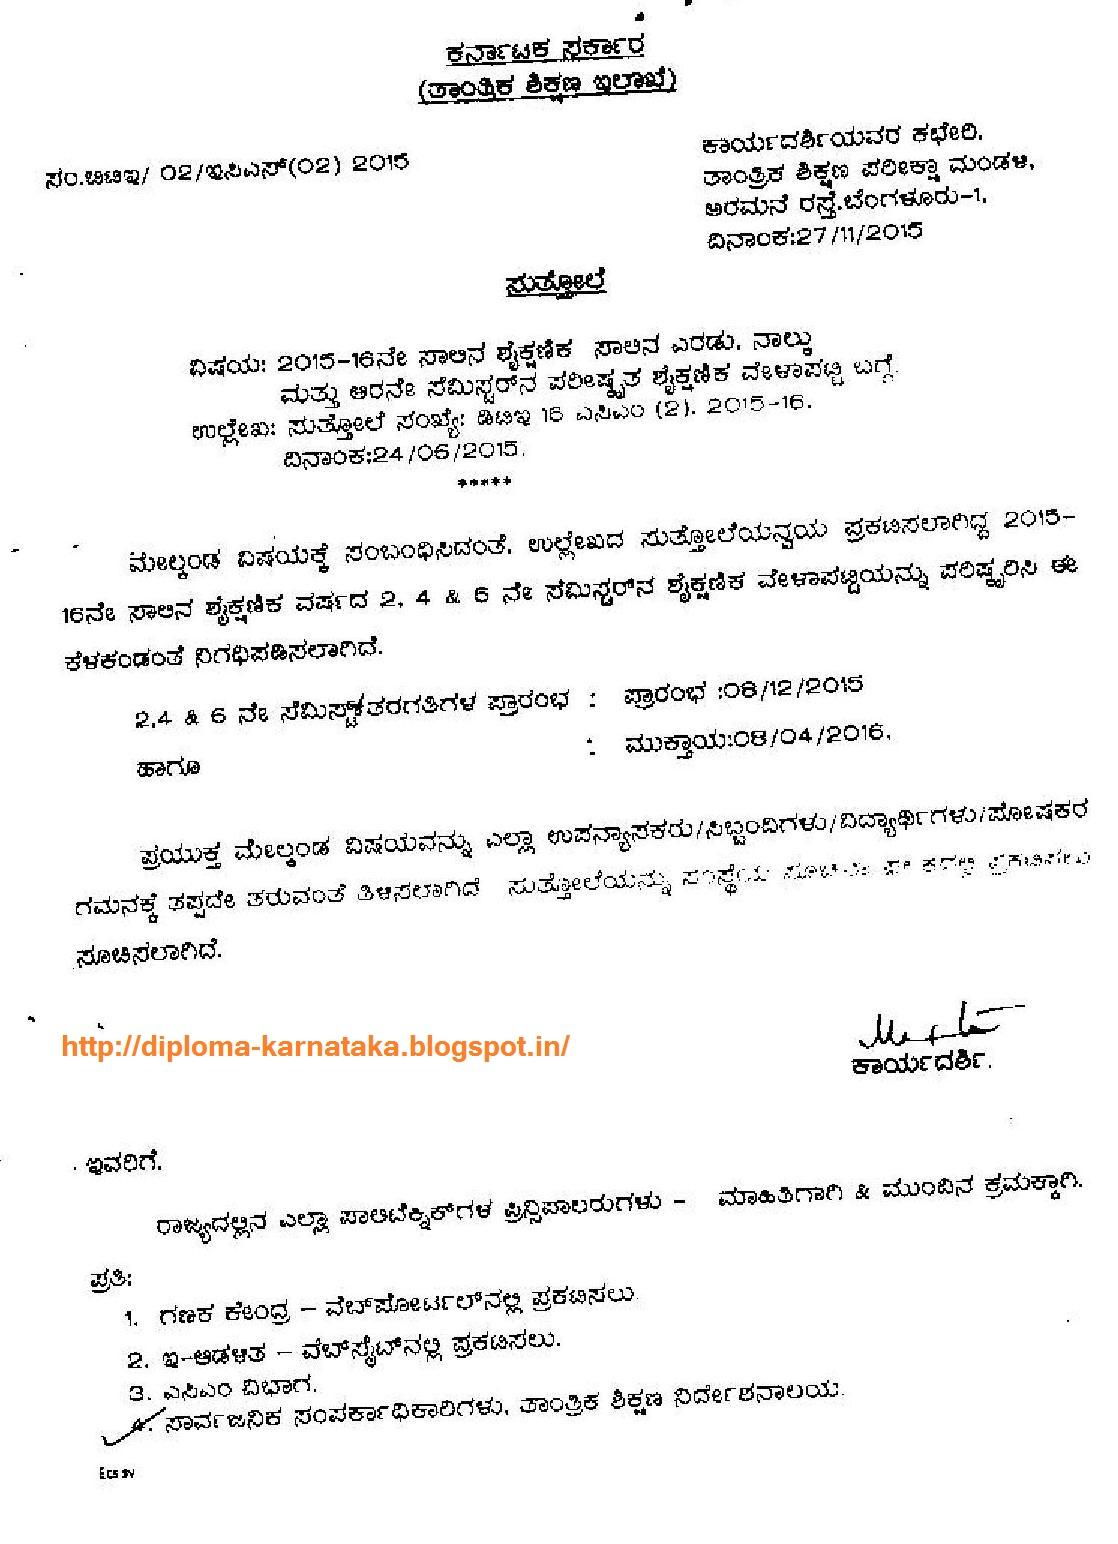 Below is the official circular form DTE Karnataka.